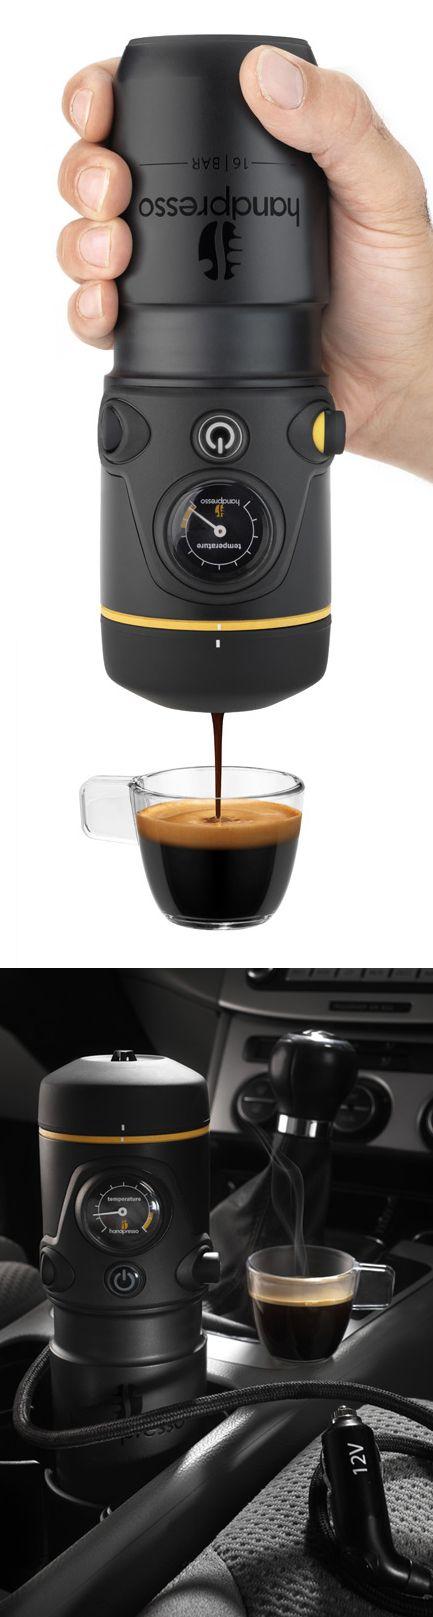 vacuum style coffee maker